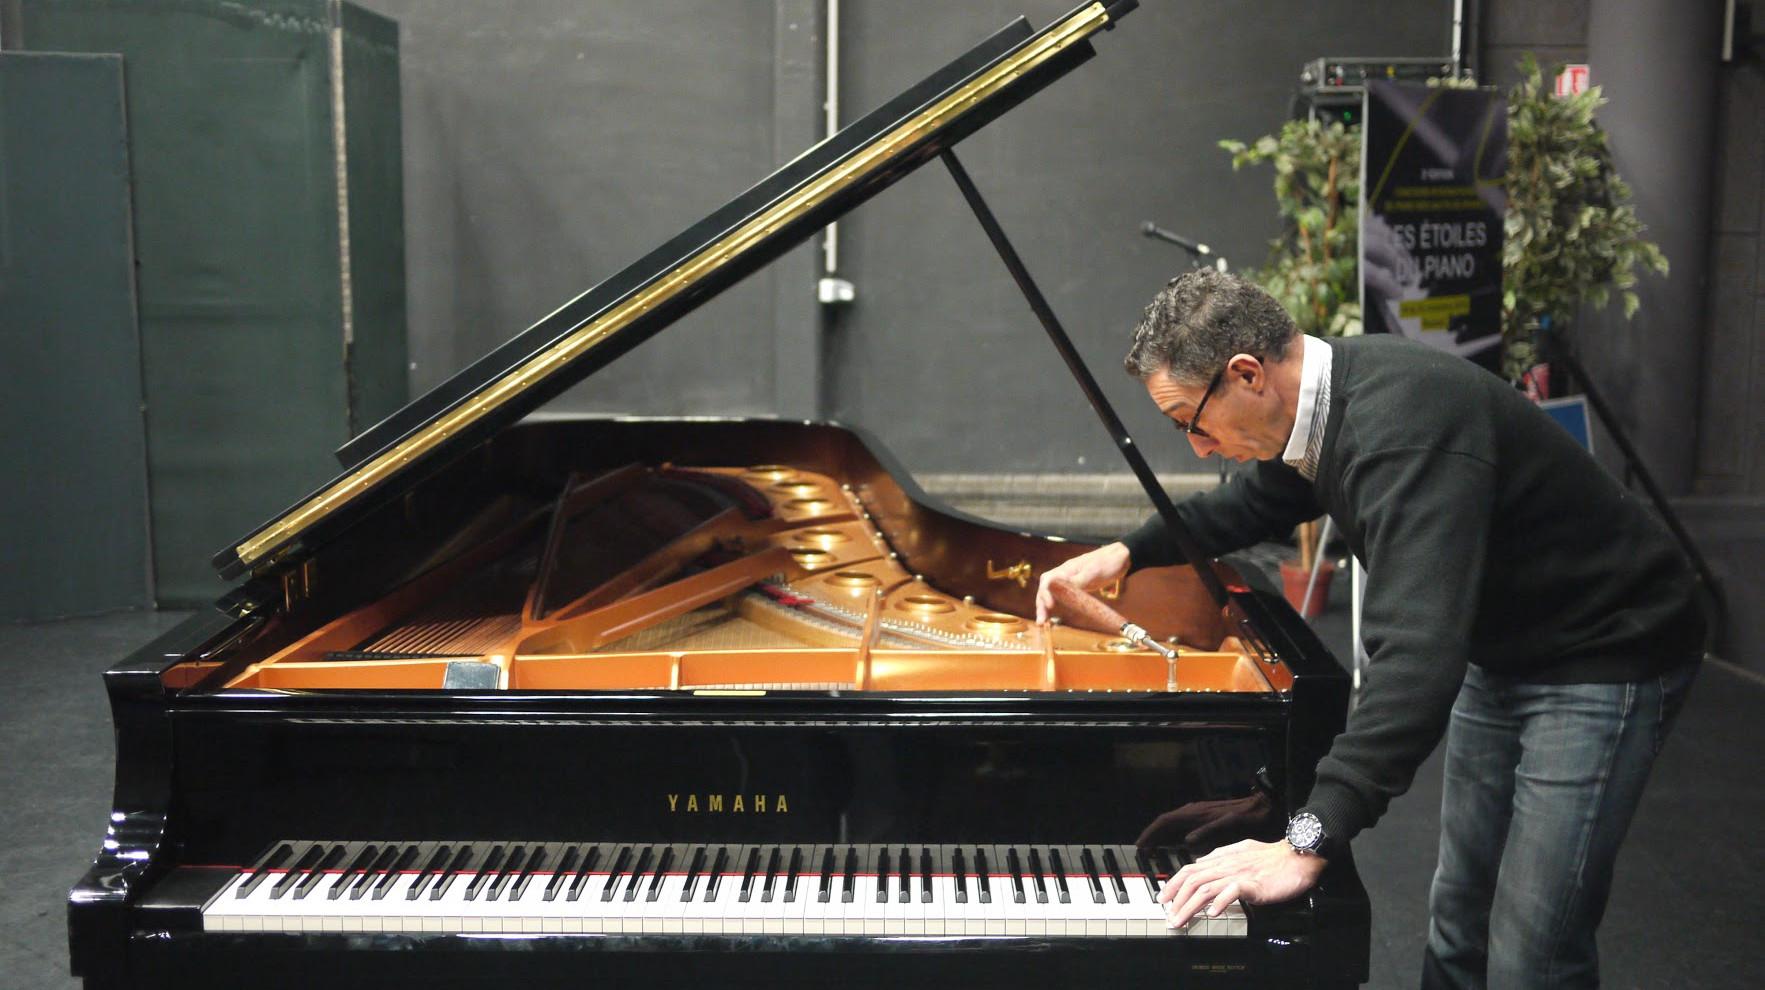 Franck Hammond Accordage du piano Grand Concert Yamaha CFX